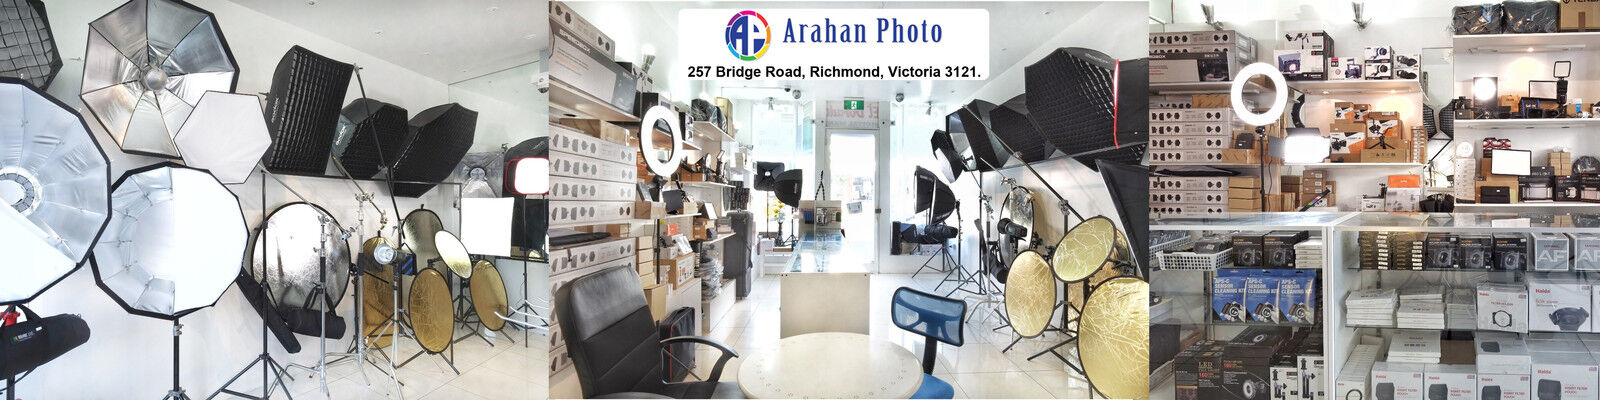 Arahan Photo